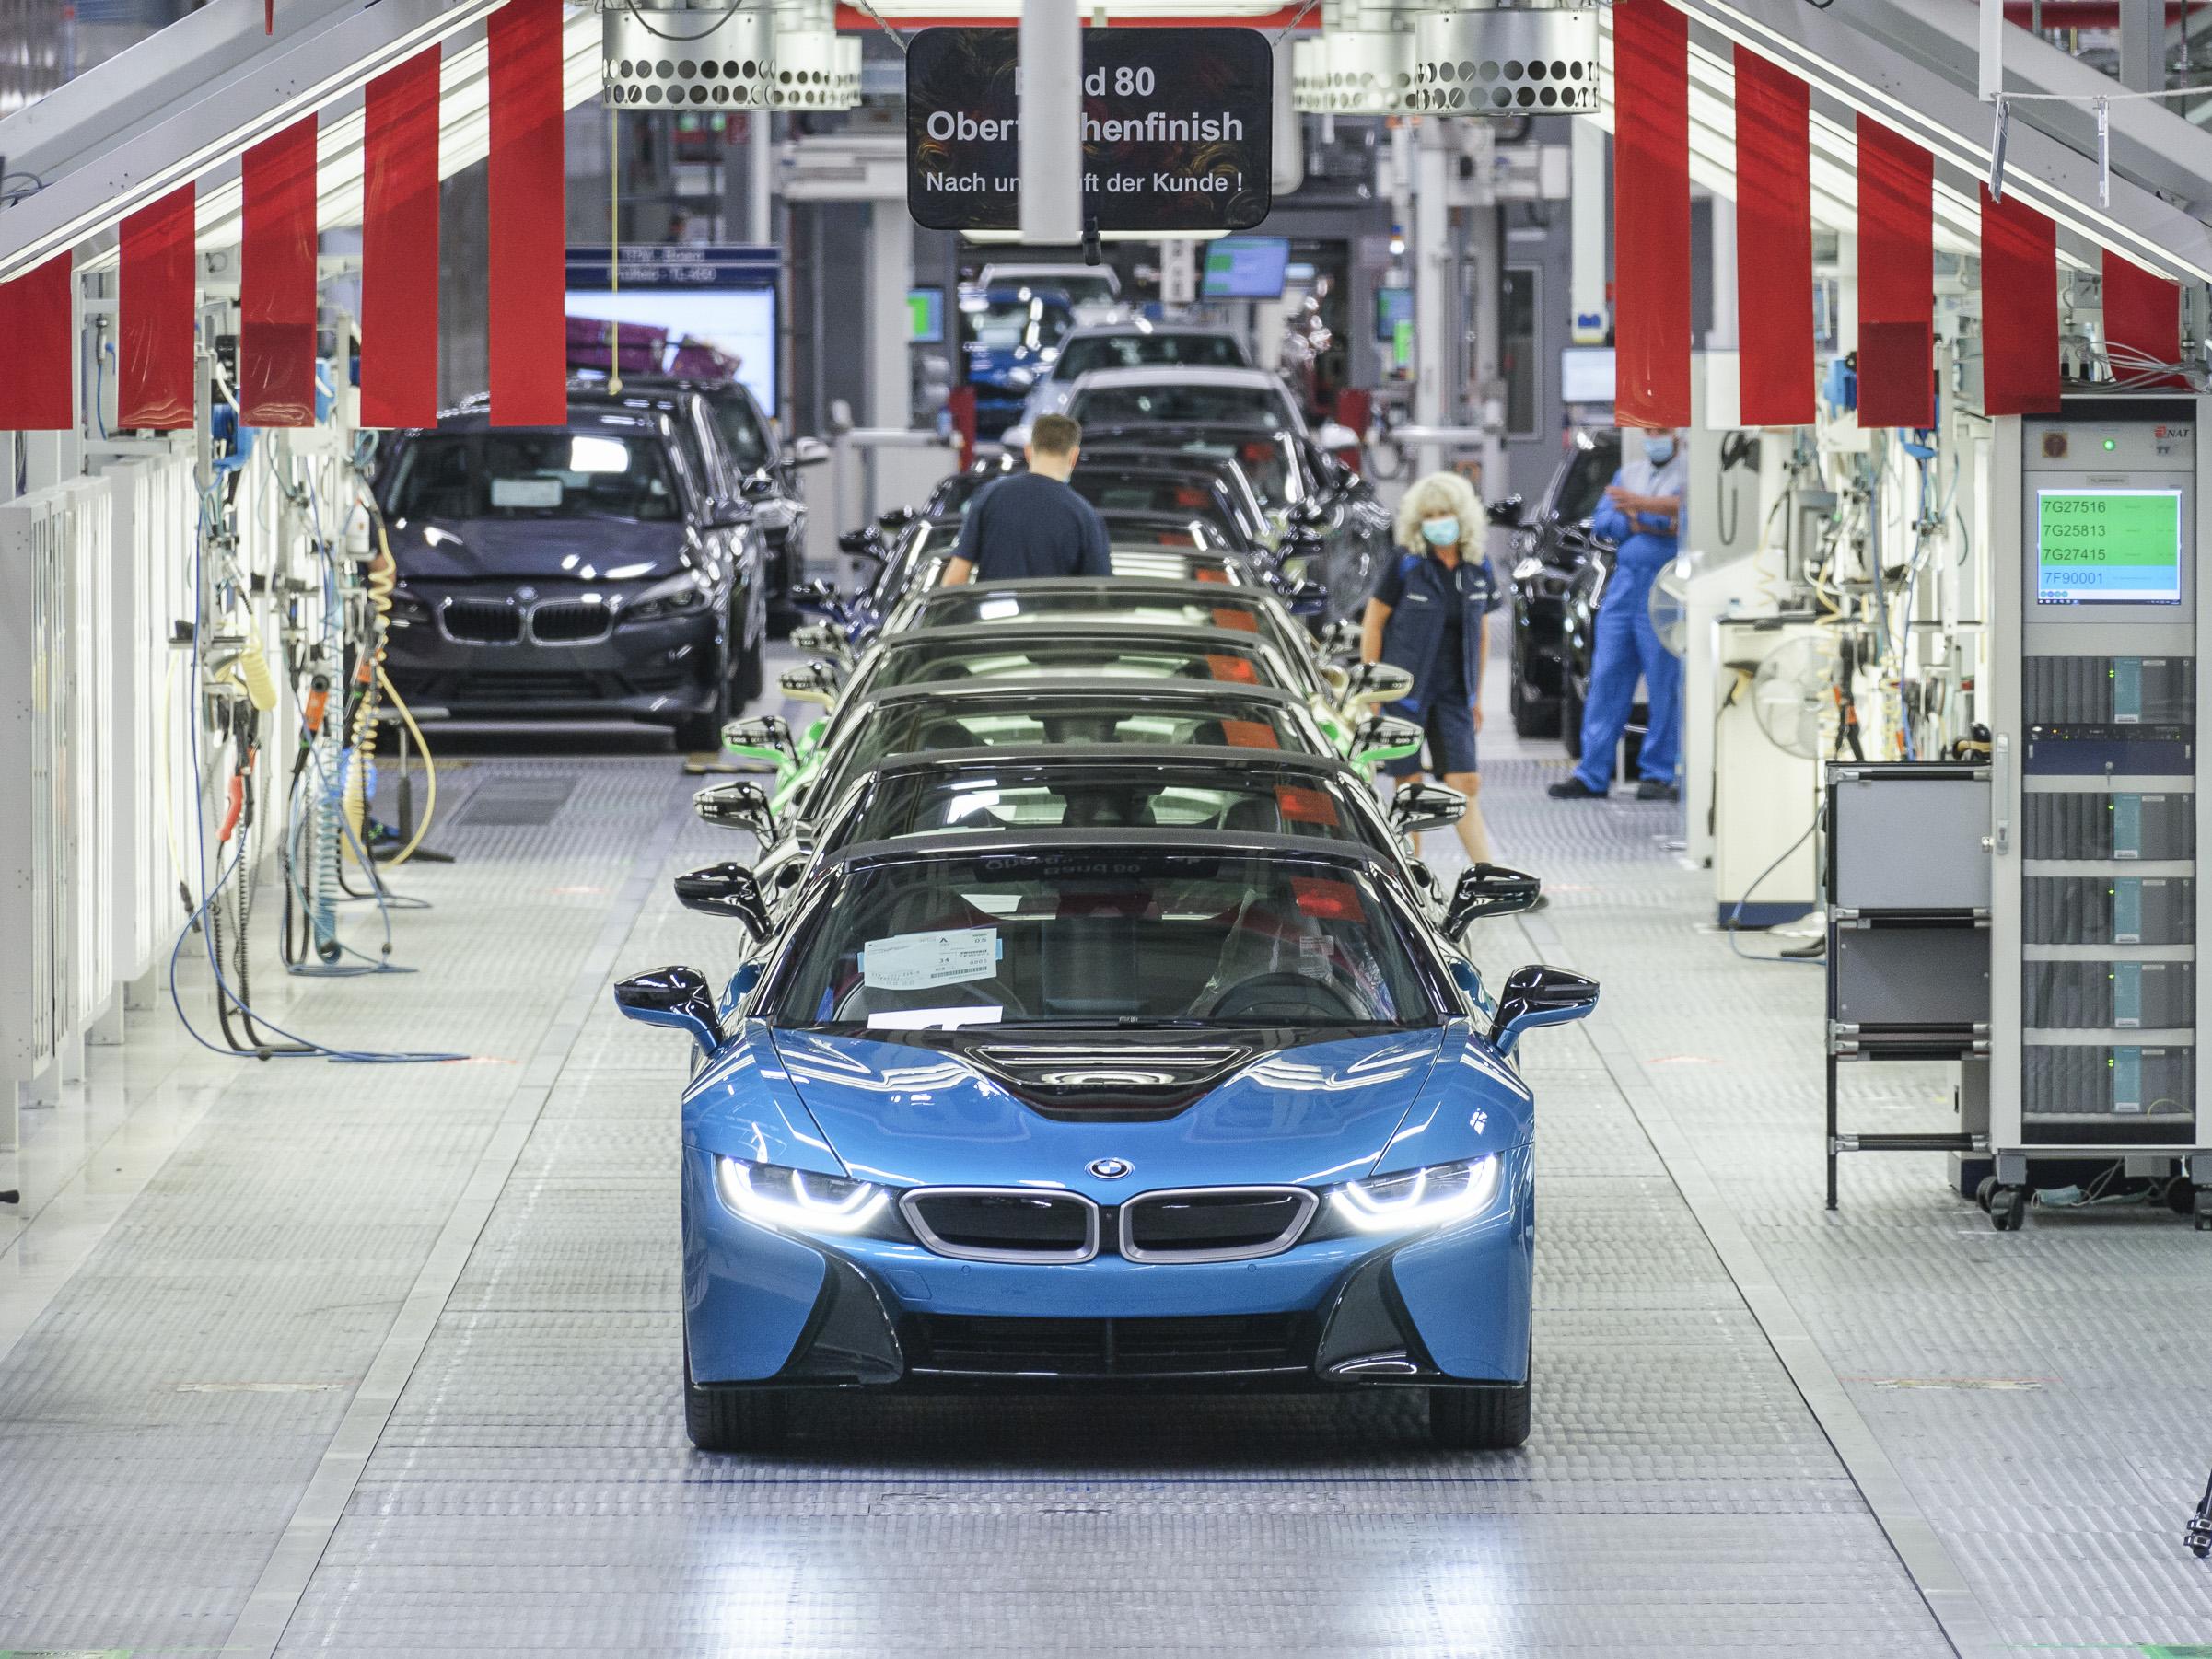 BMW i8 final 18 -factory 3